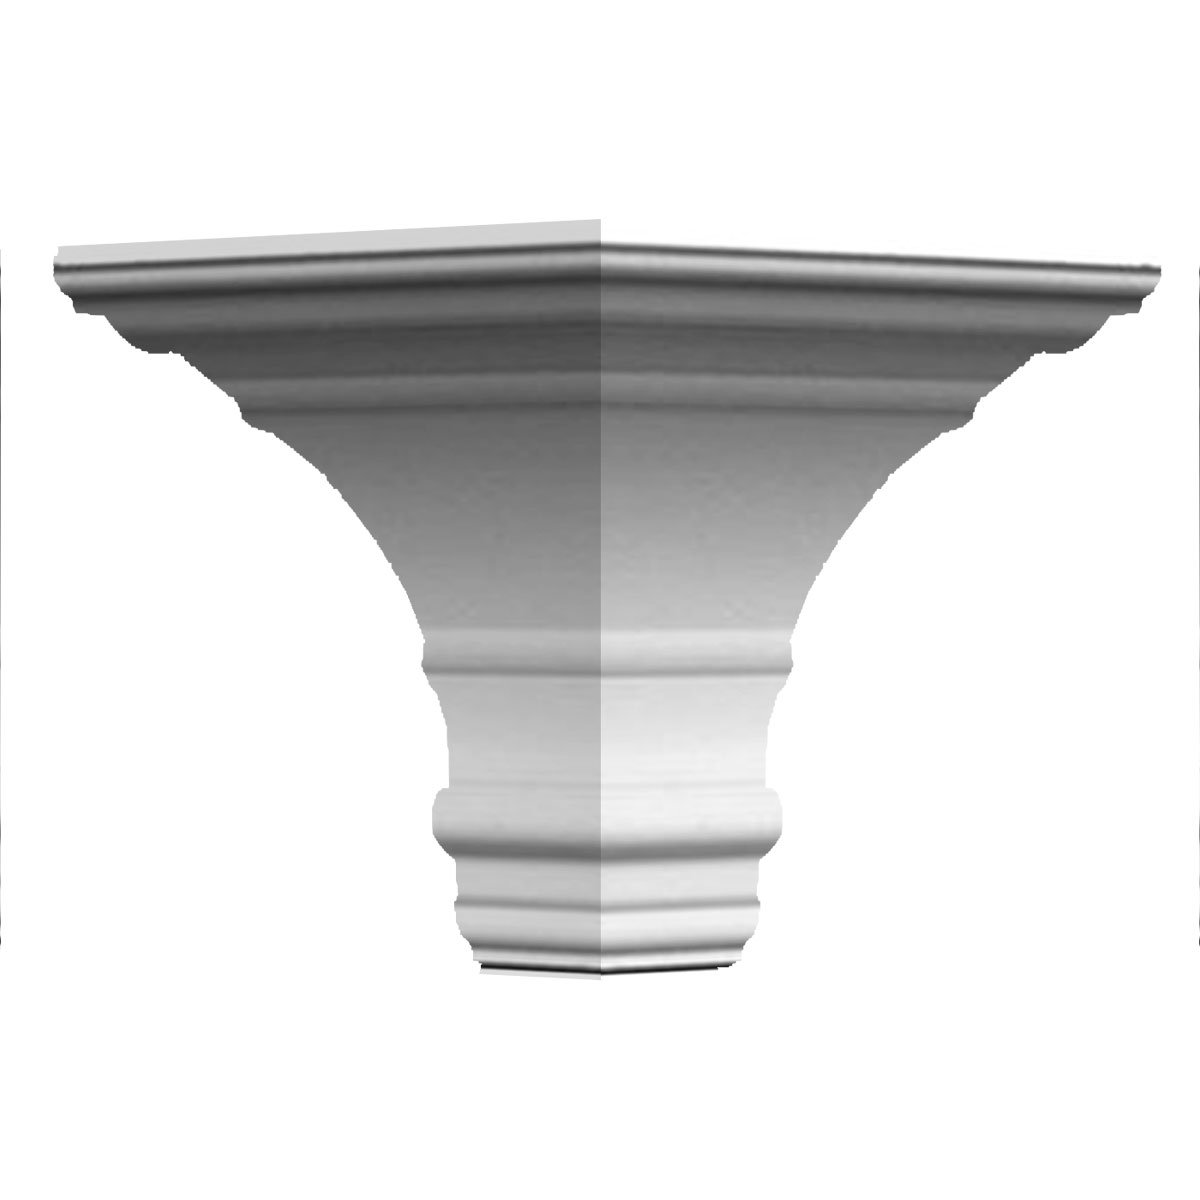 "Ekena Millwork MOC07X06FO Outside Corner (Matches Moulding MLD06X07X09FO), 7""P x 6 3/4""H, White"